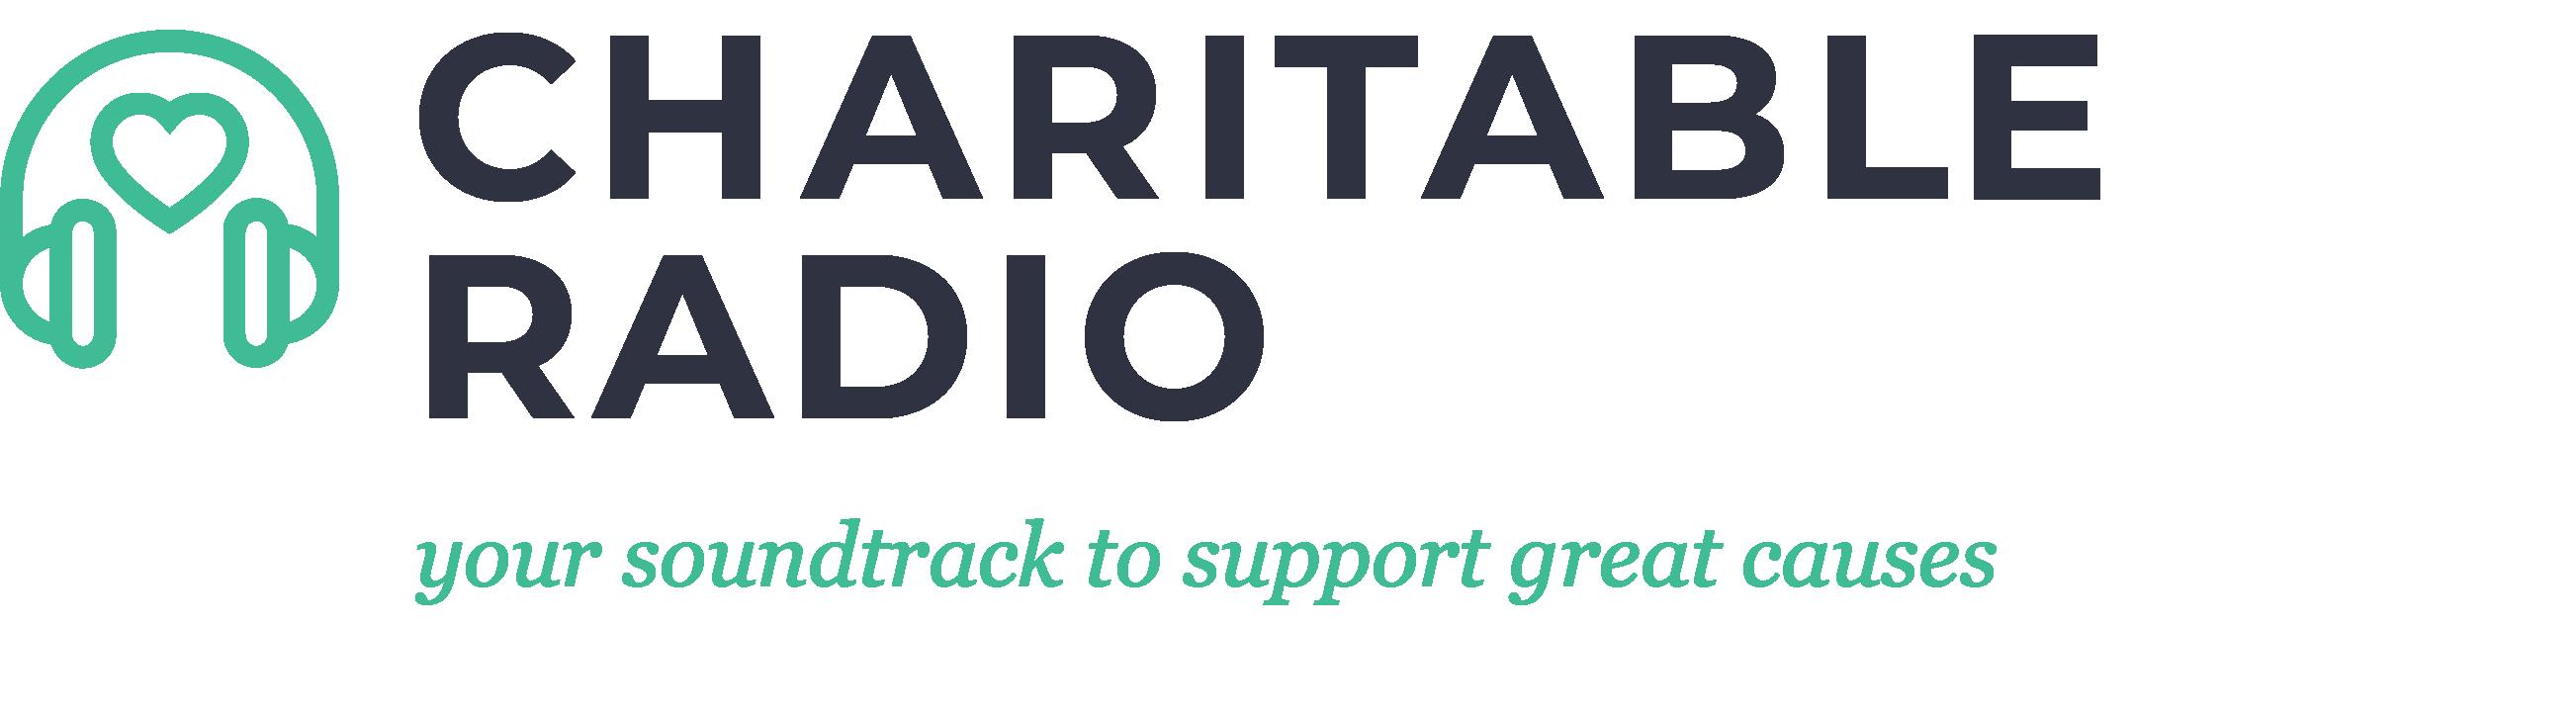 Charitable Radio Logo - 15Oct20